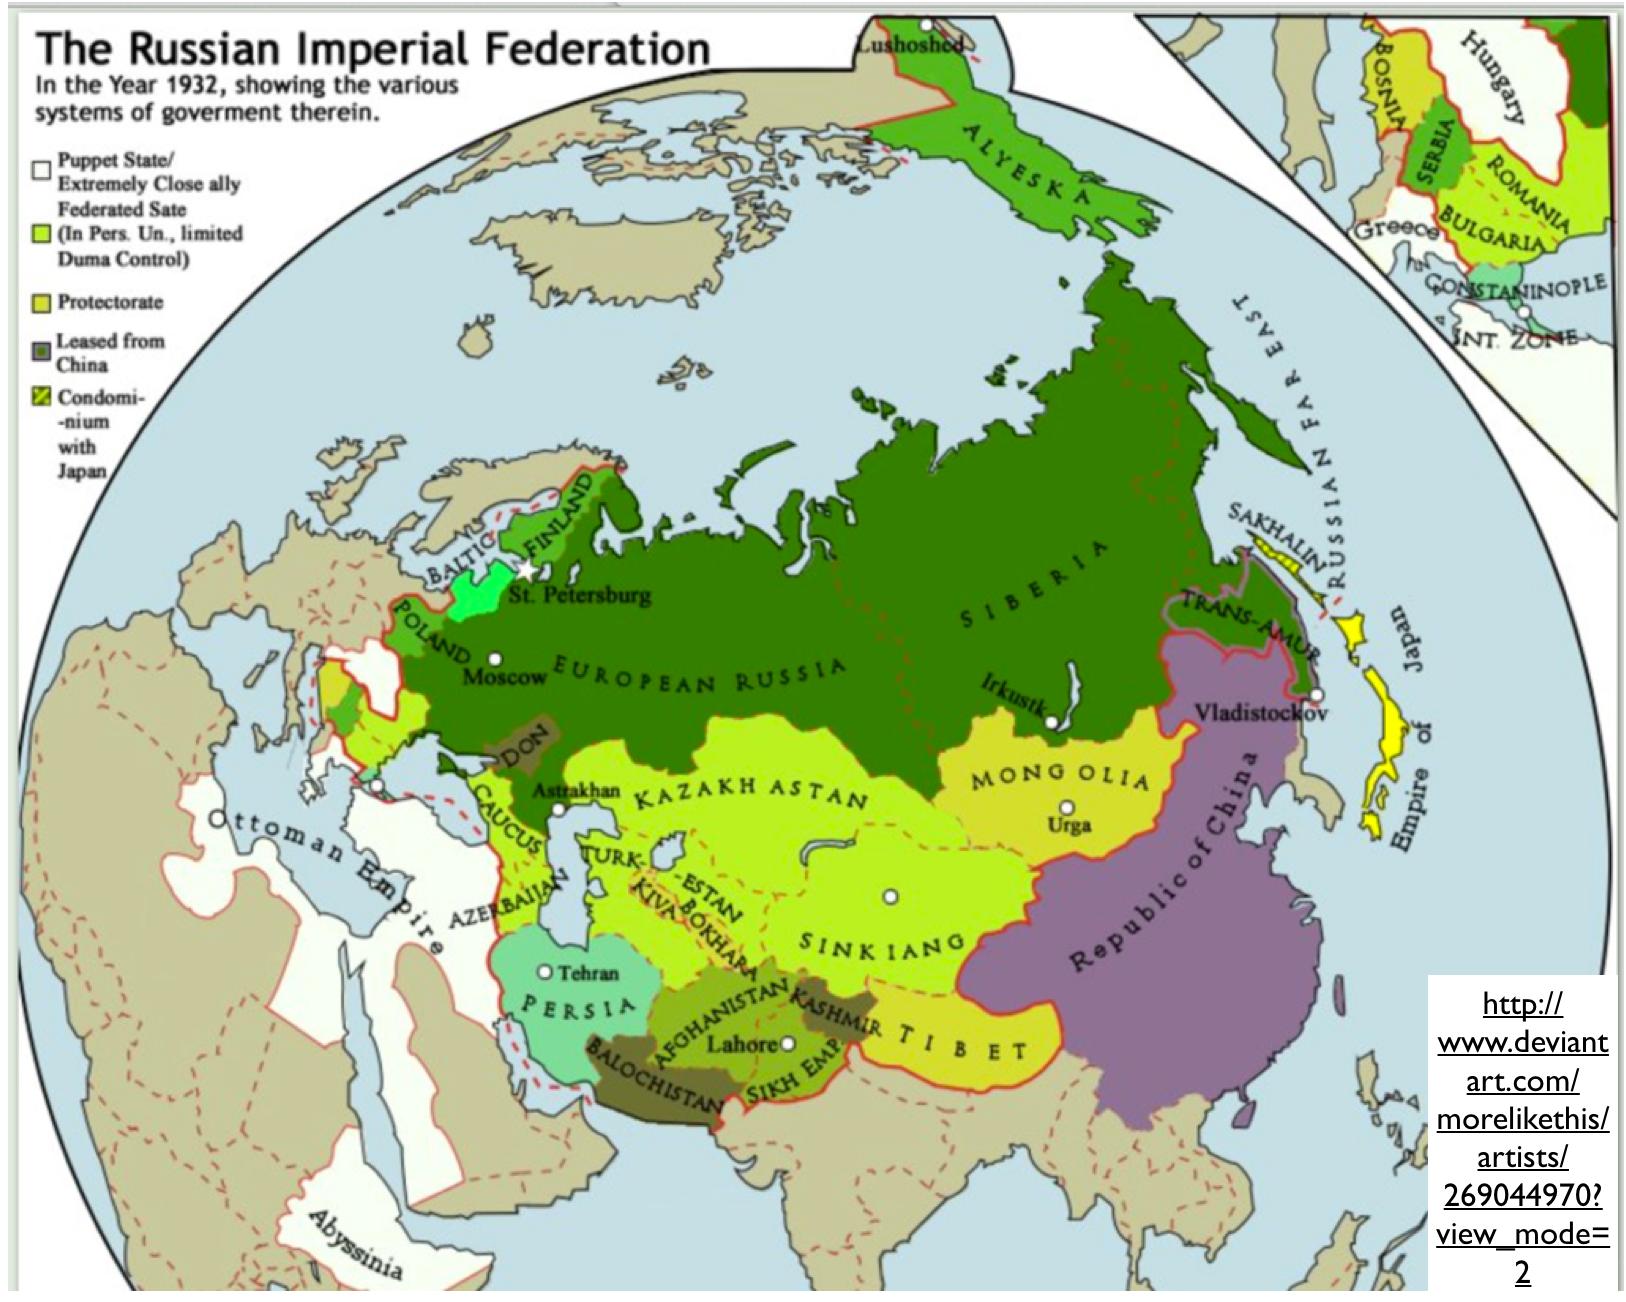 LoveLuxleBlog: Russia Federation Map